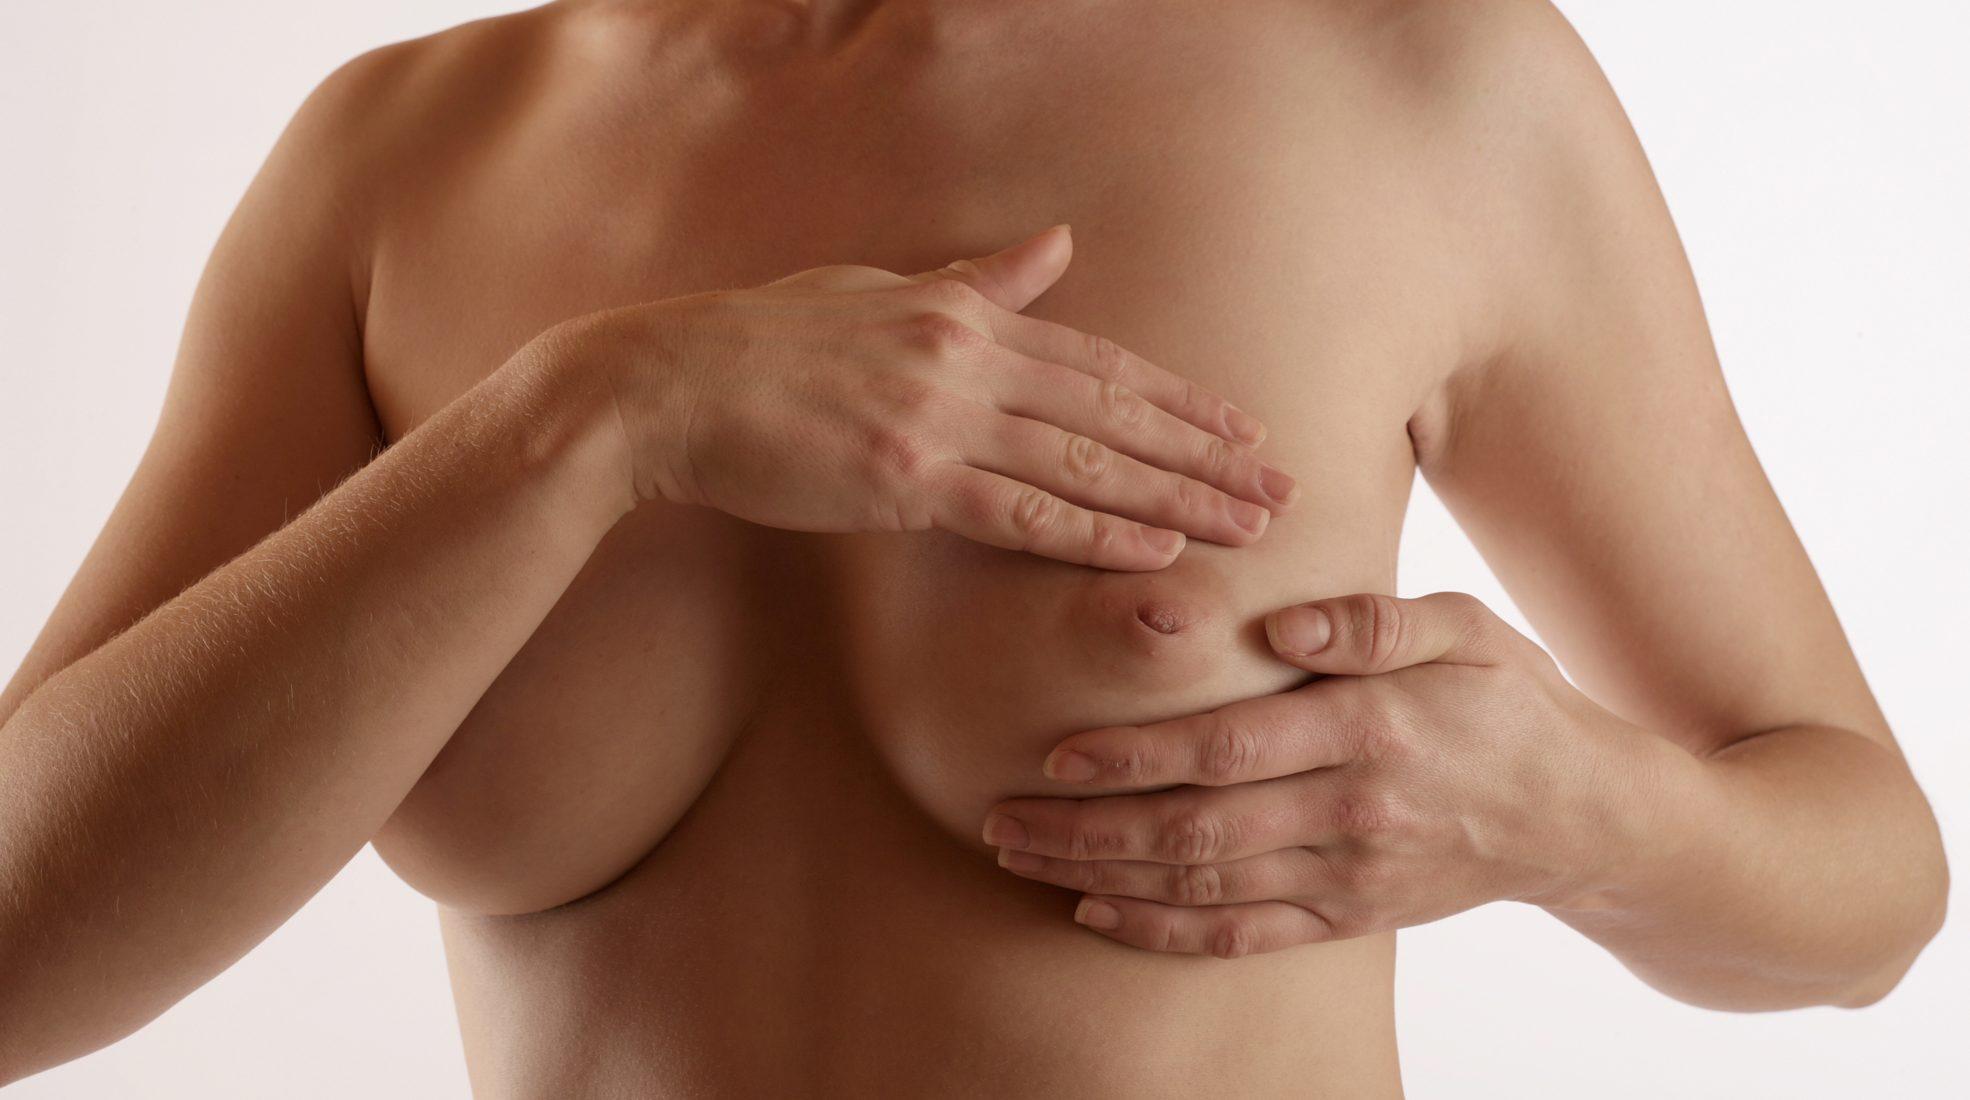 underliv, menstruation, menstruationssmerter, bryster, ømhed, blødning